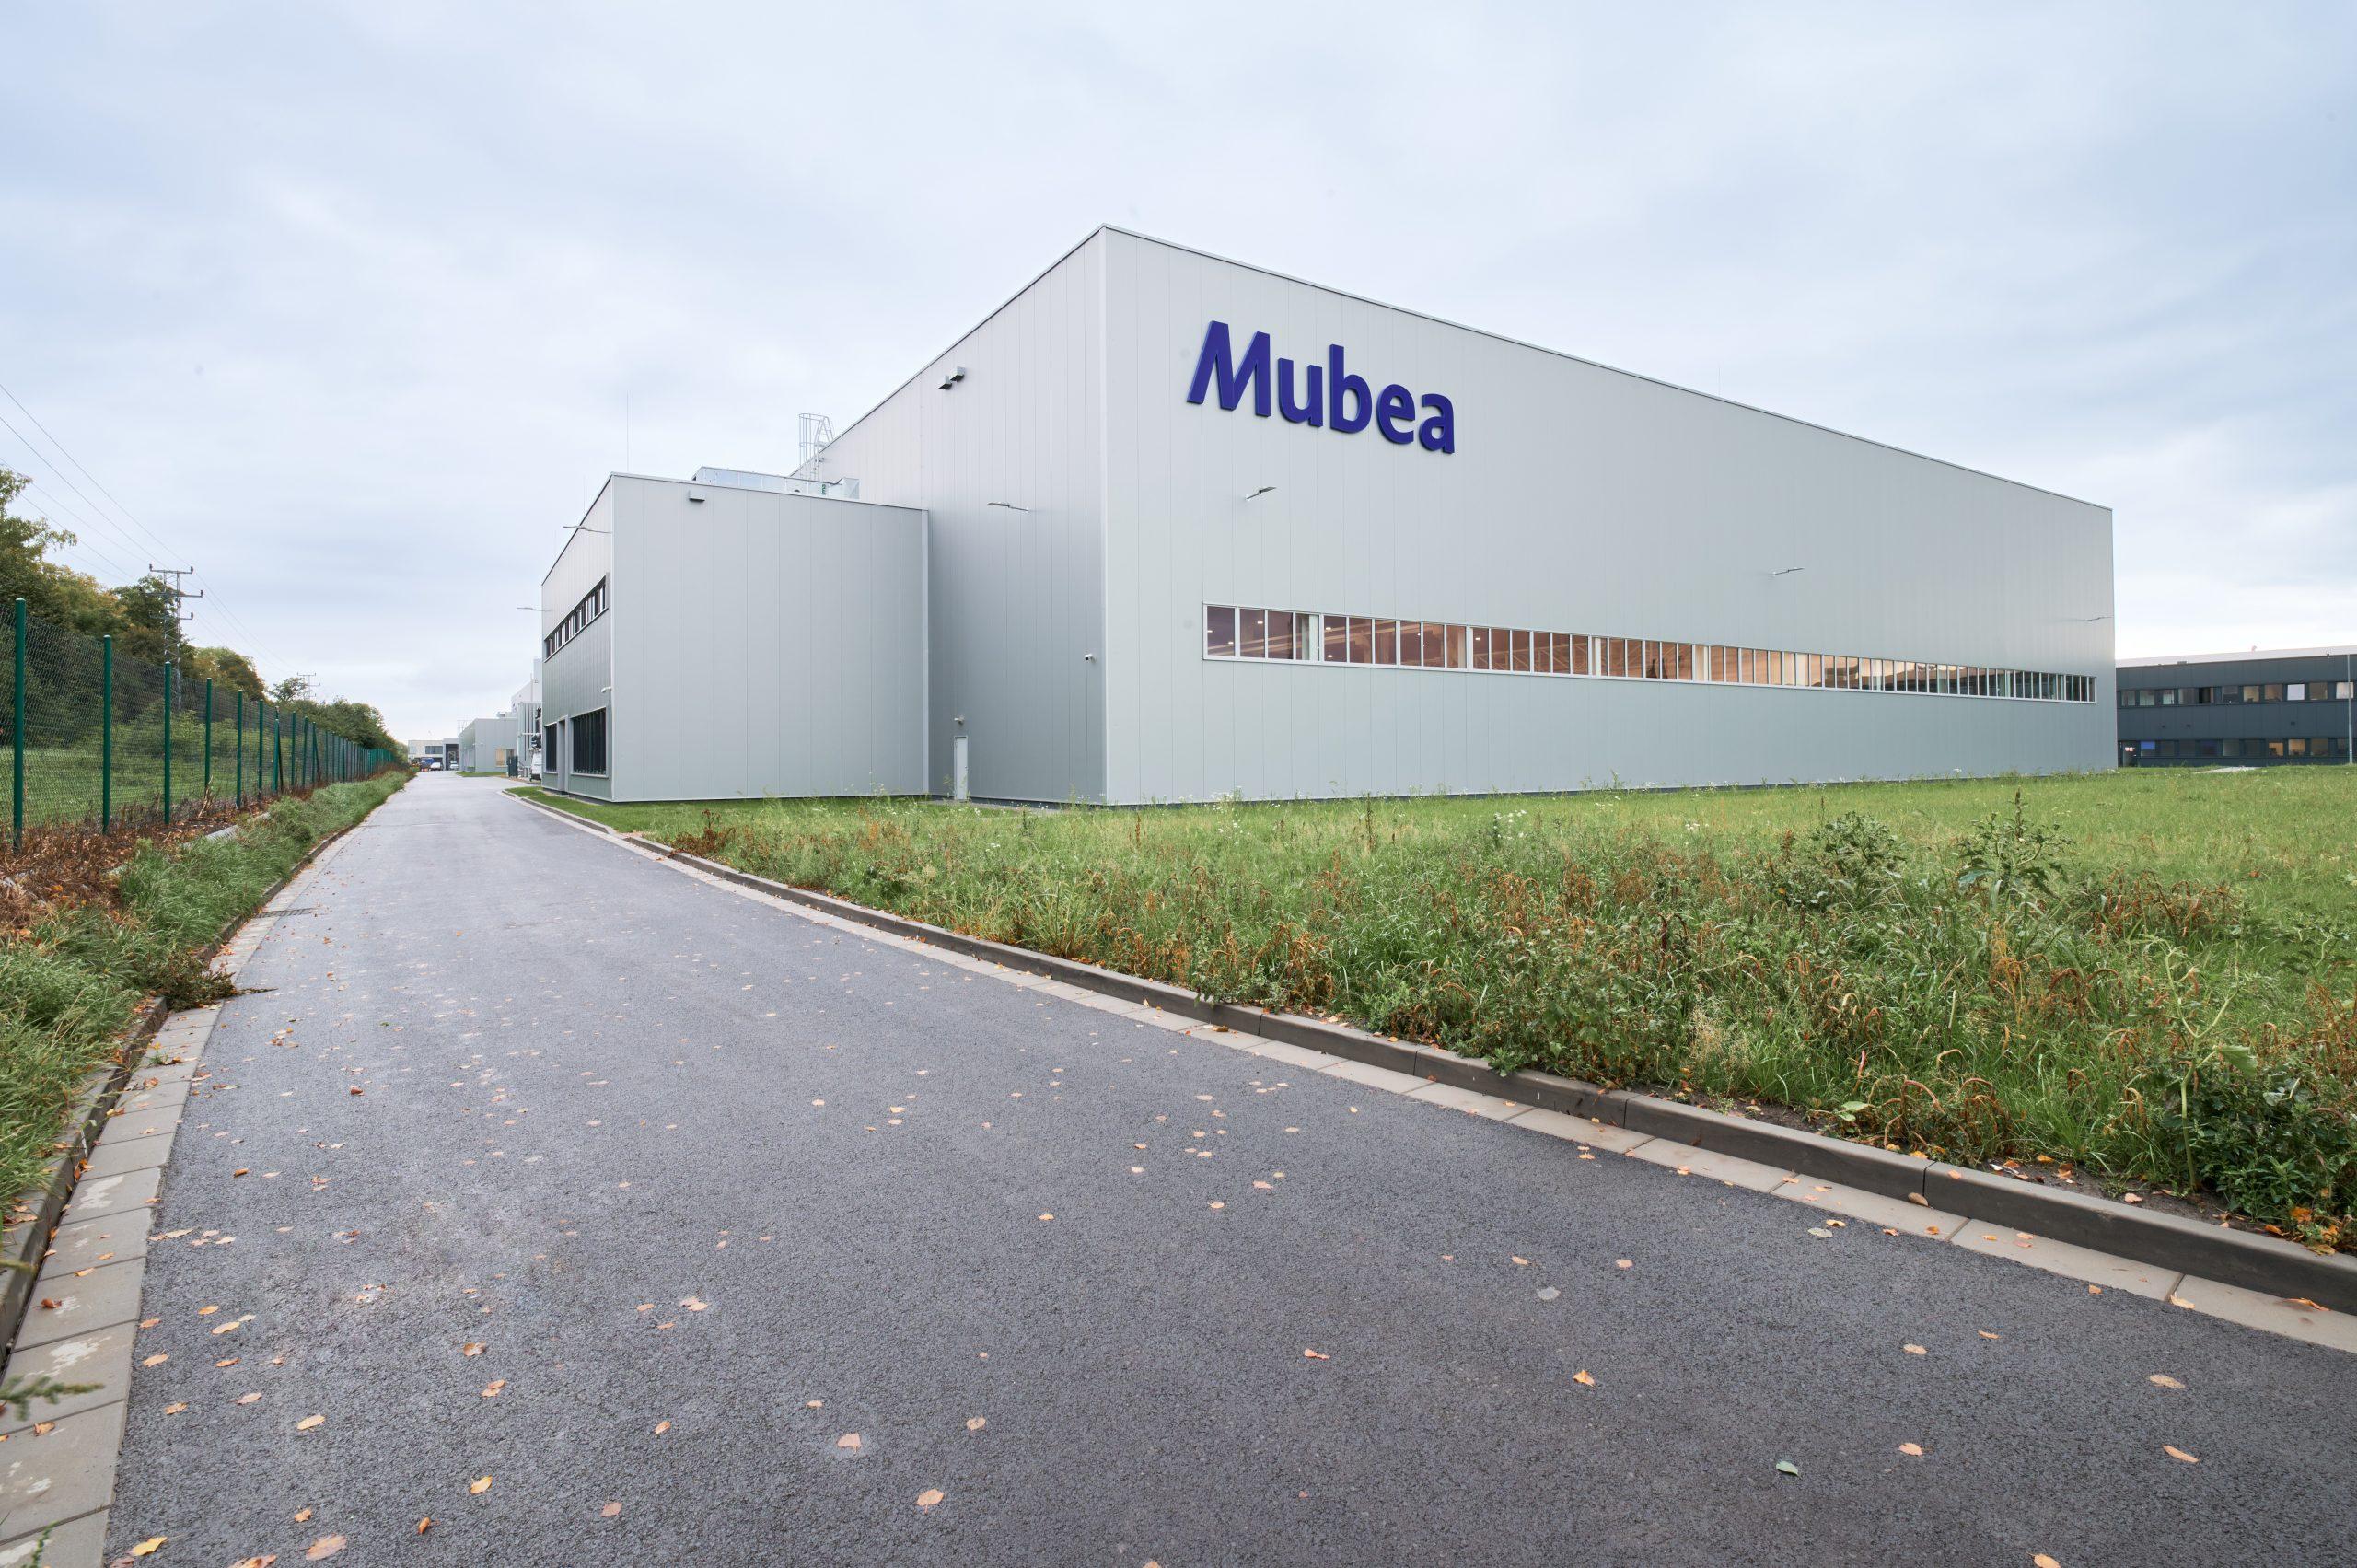 Mubea factory extension in Prostejov, Czech Republic, built by Takenaka Europe